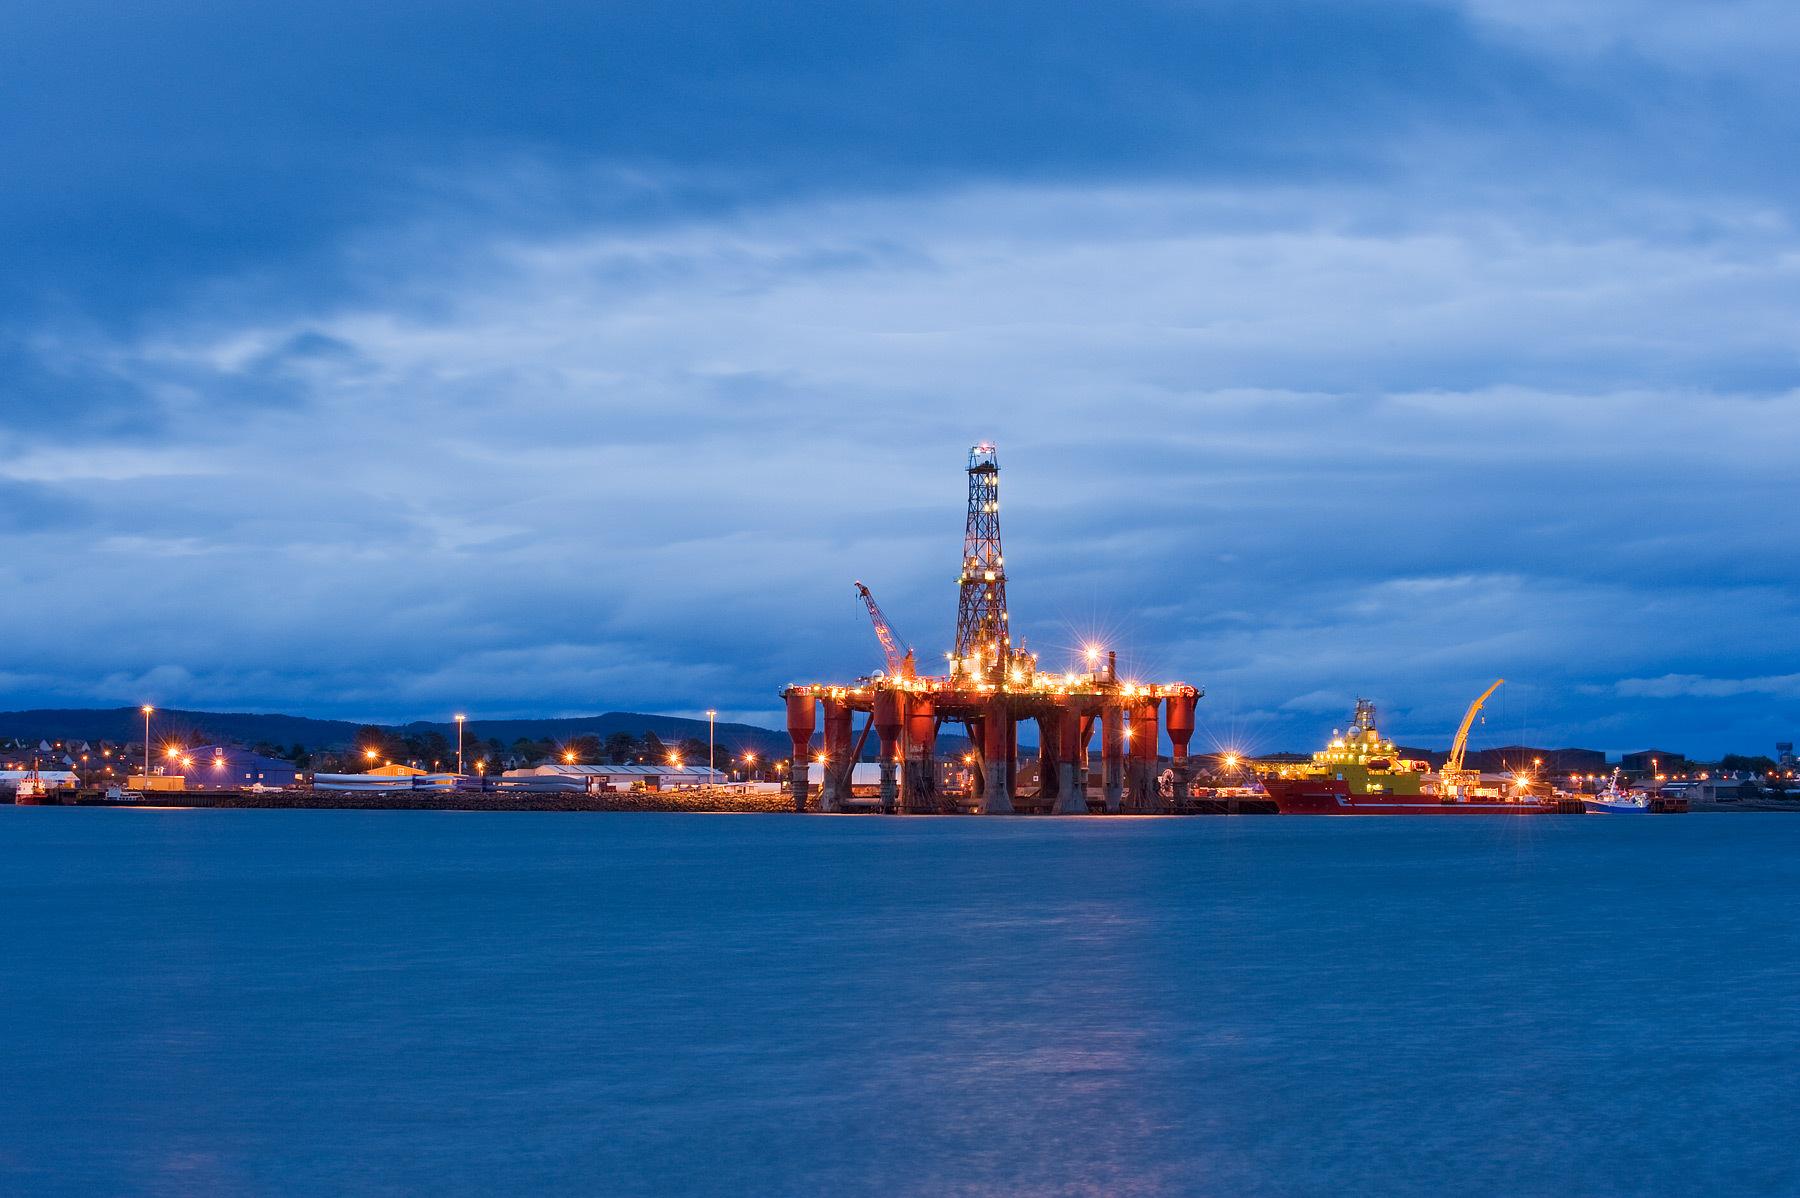 Oil rigs moored in Cromarty Firth. Invergordon, Scotland, UK -- Berardo62/flickr.com